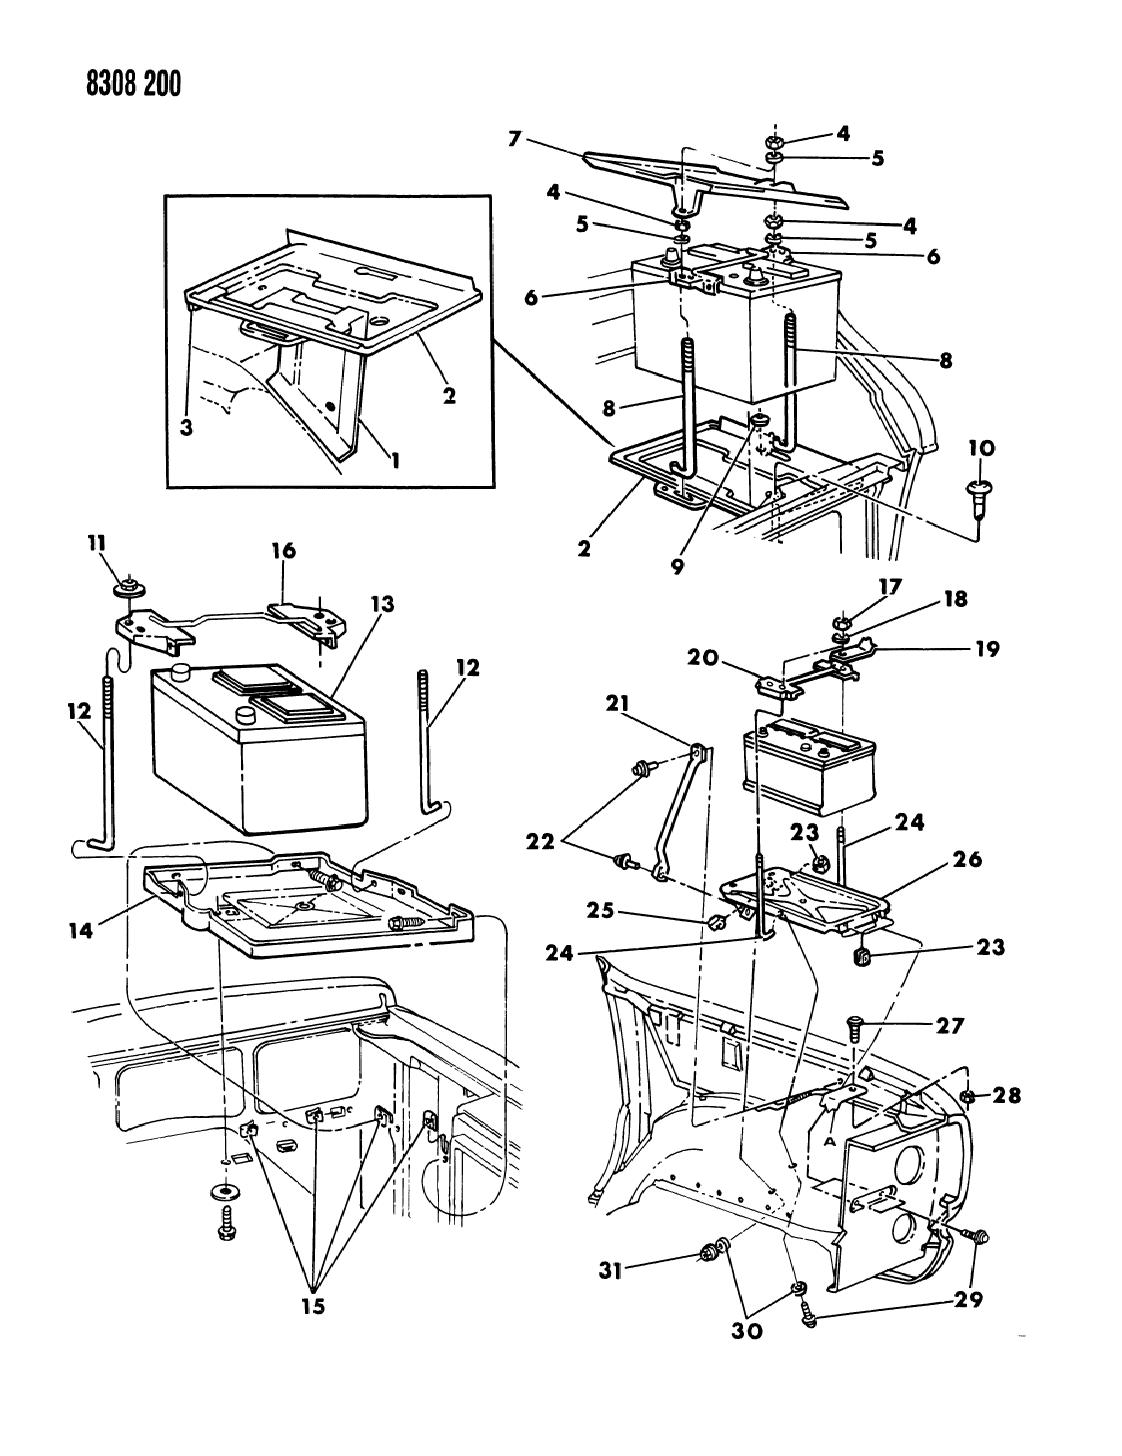 1989 Dodge Ram Van Battery Tray Mopar Parts Giant Wiring Diagram